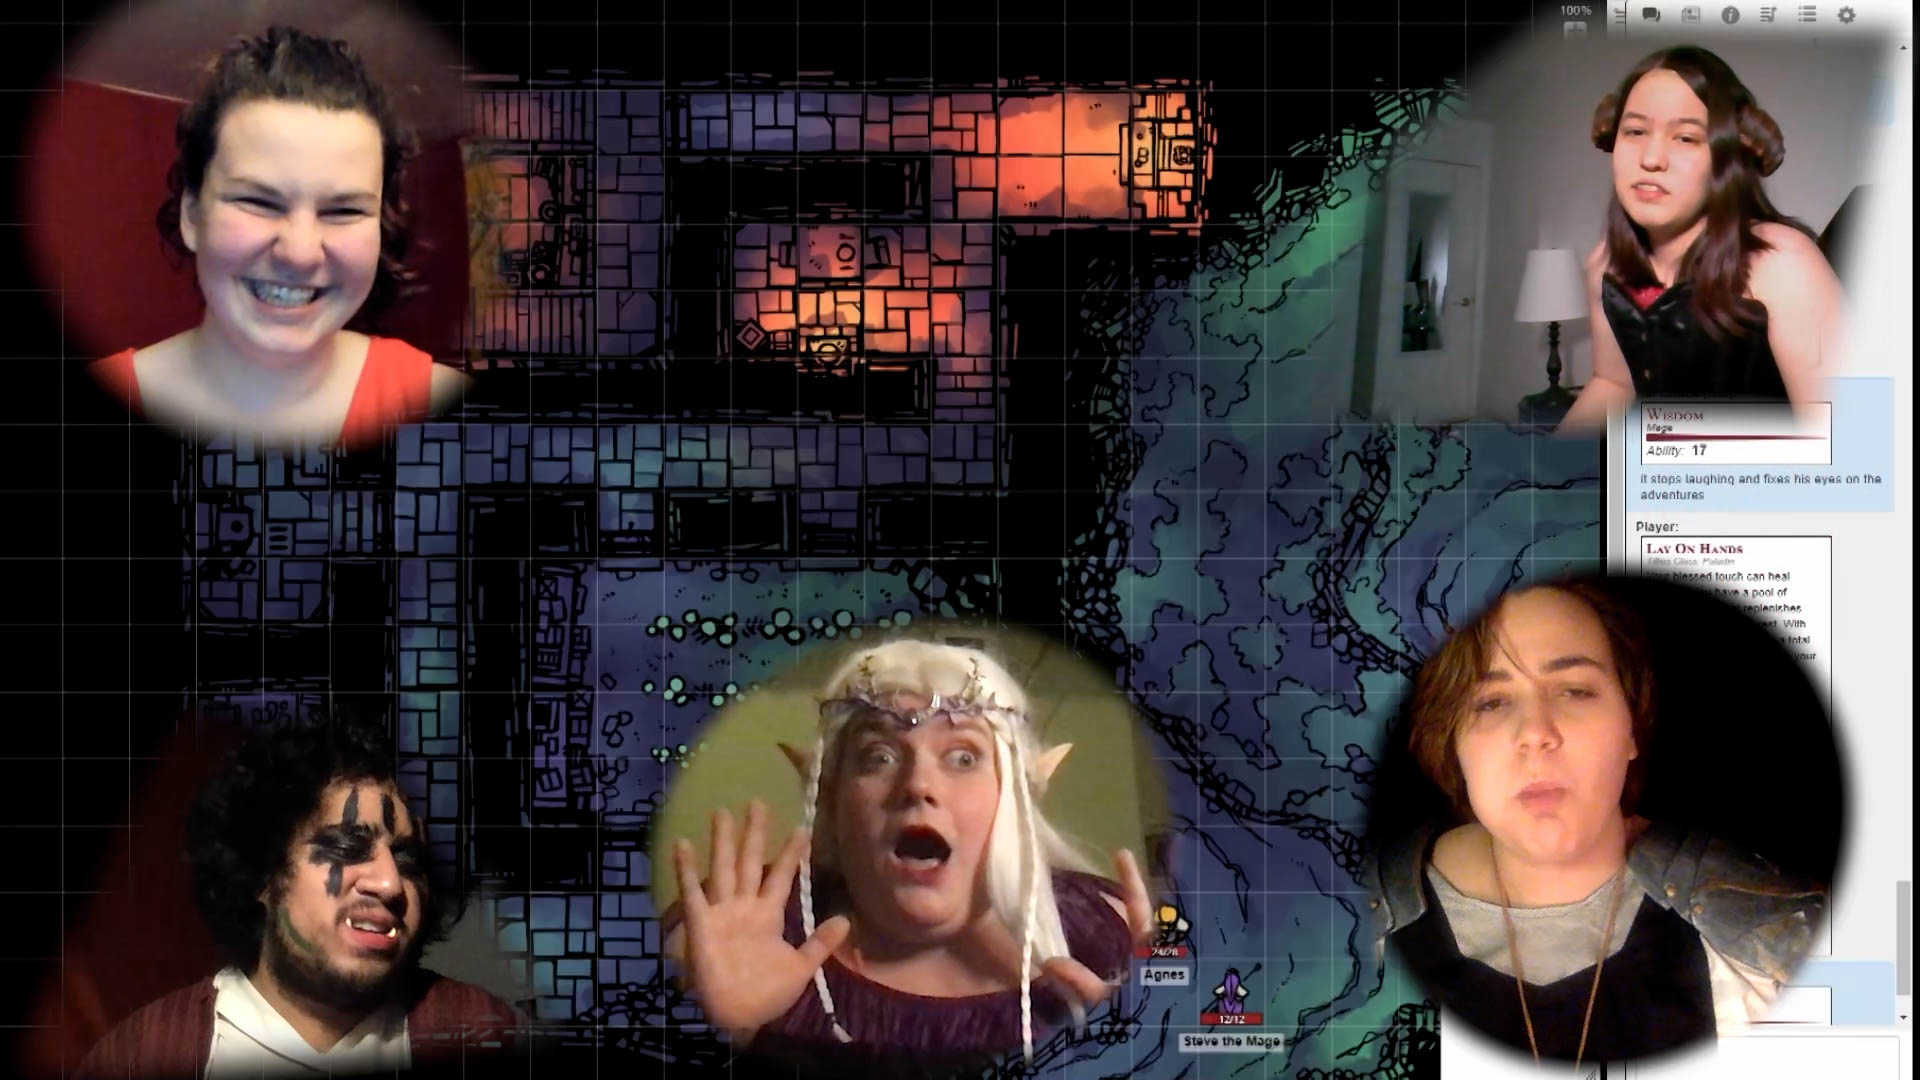 She Kills Monsters screen capture